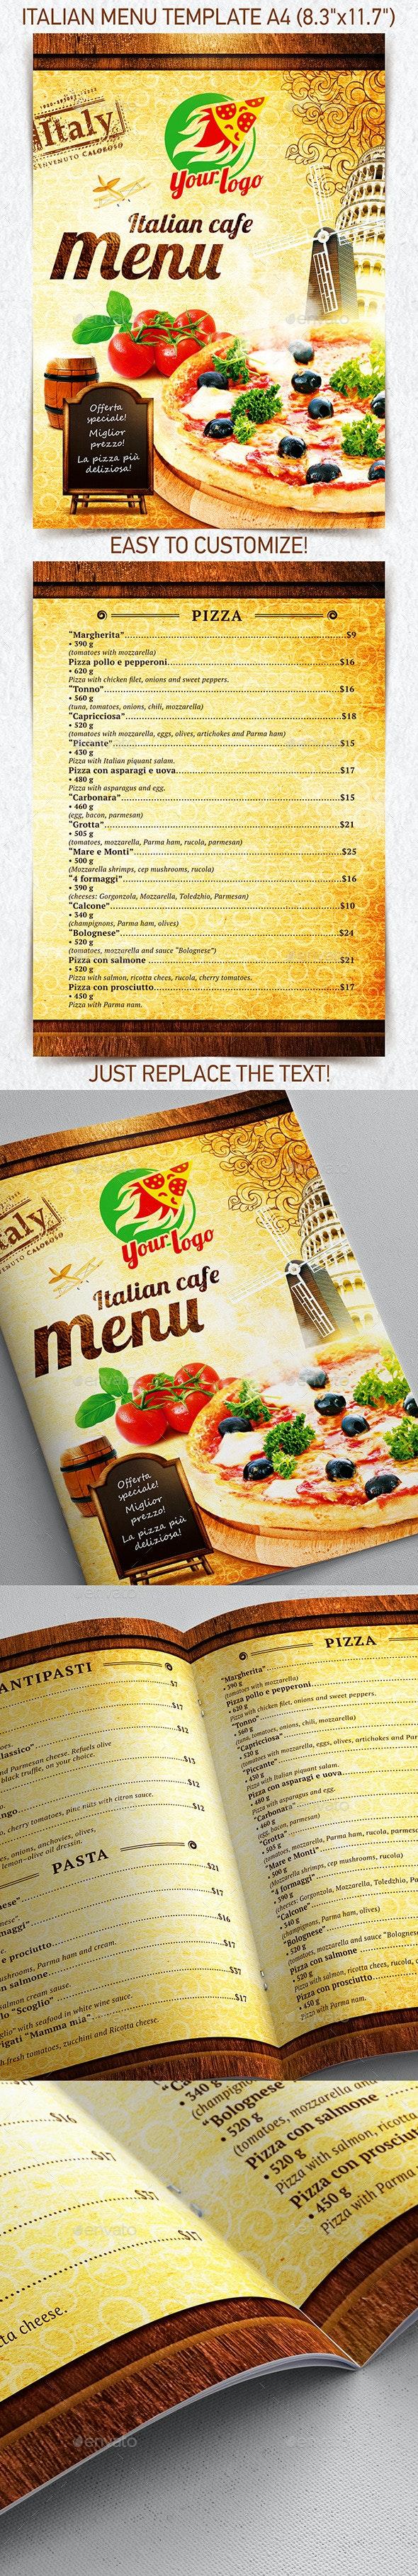 Italian Menu Template vol.1 - Food Menus Print Templates